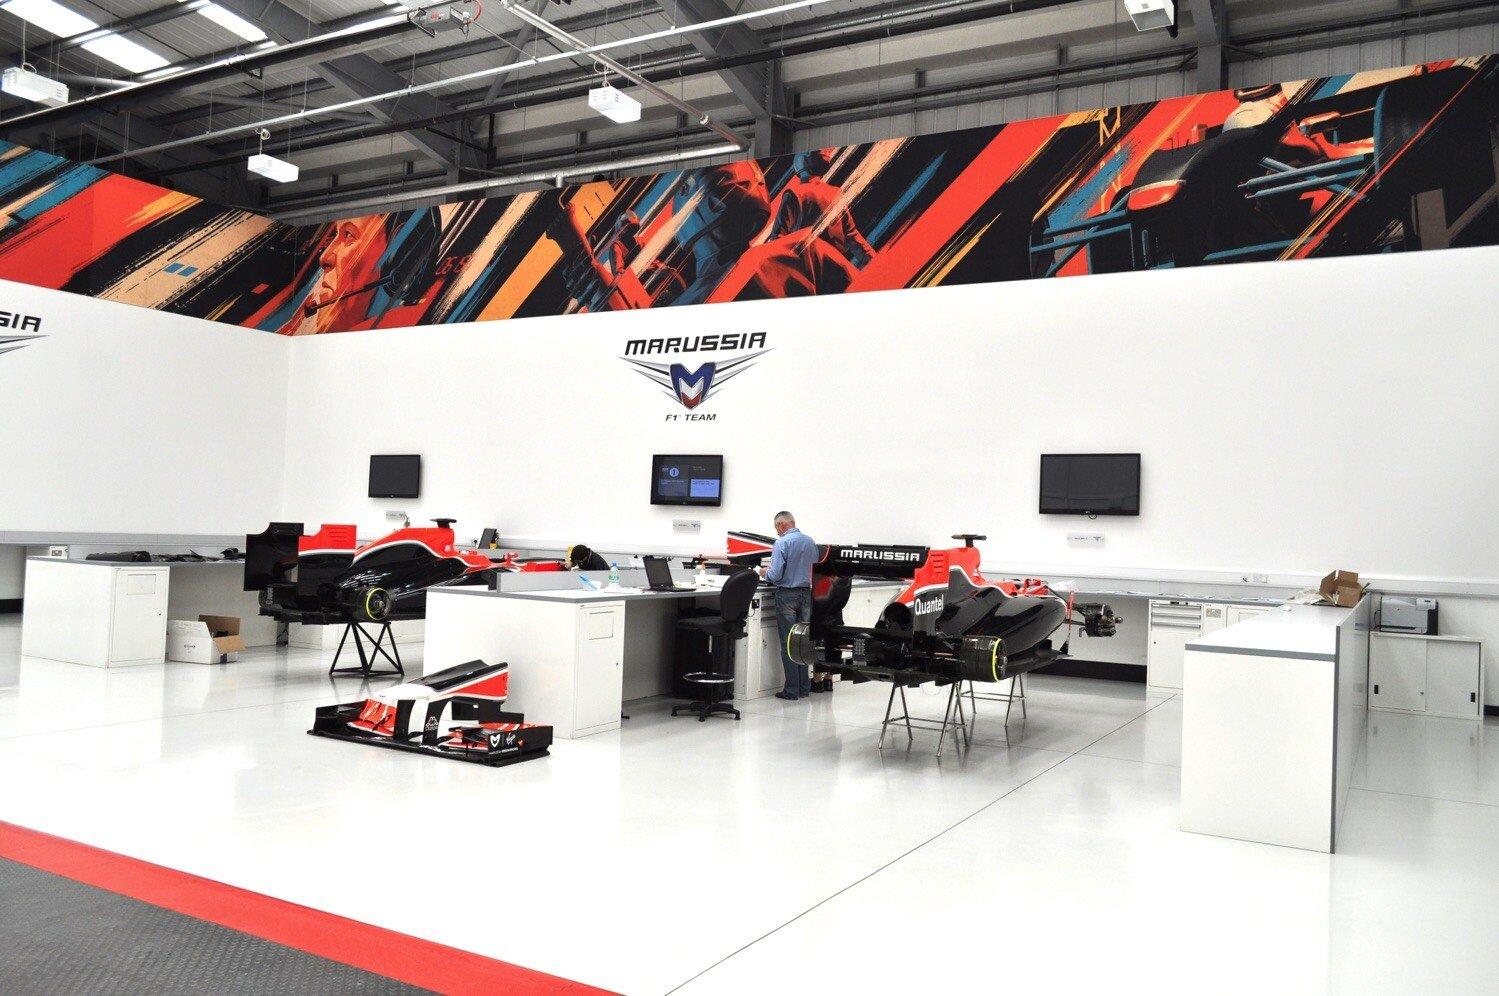 tavis-coburn-F1-team-graphic-illustration-marussia-31.jpg